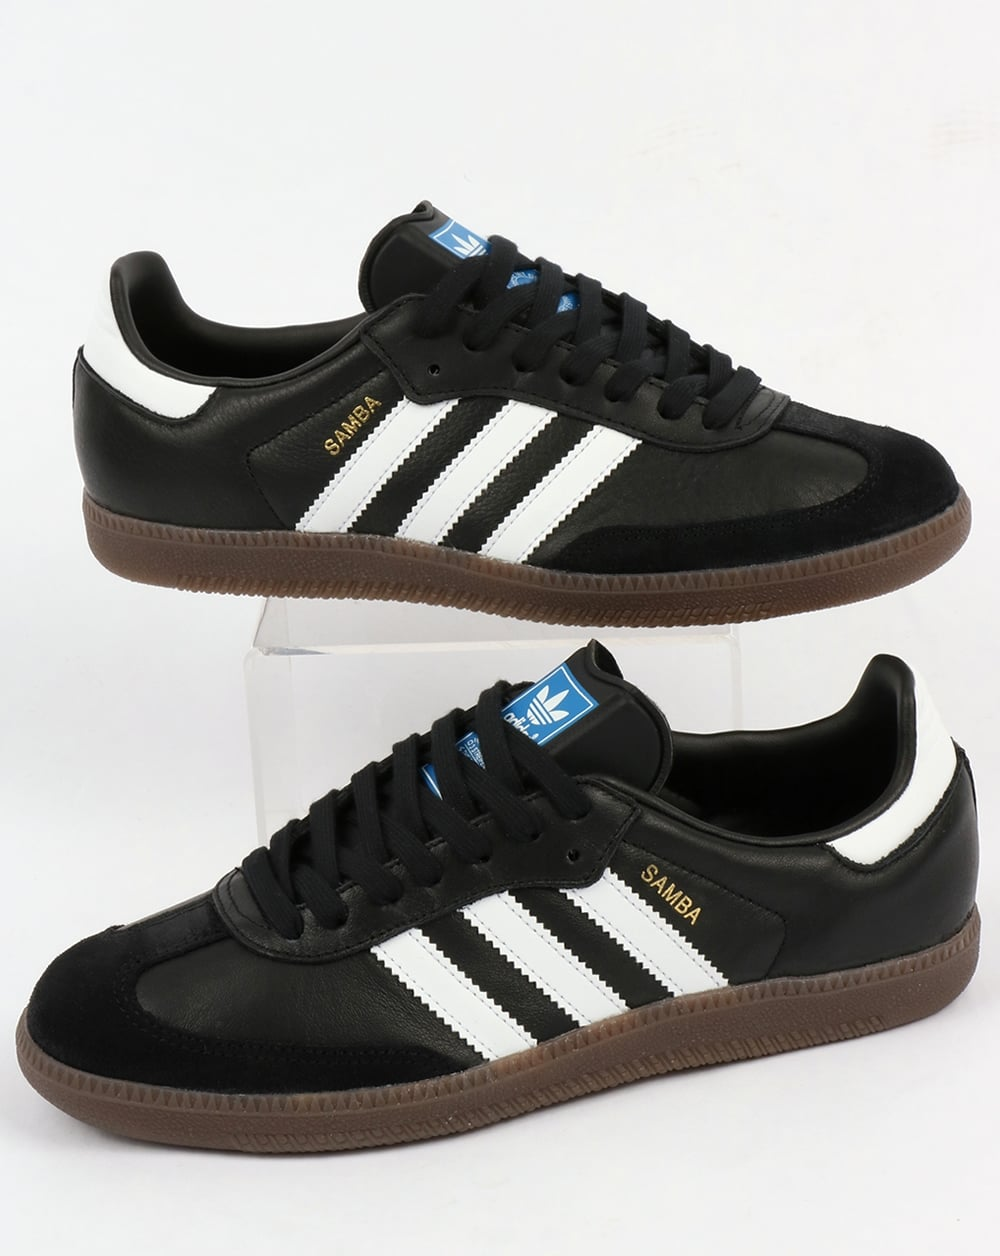 adidas Trainers Adidas Samba OG Trainers Black/White/Gum